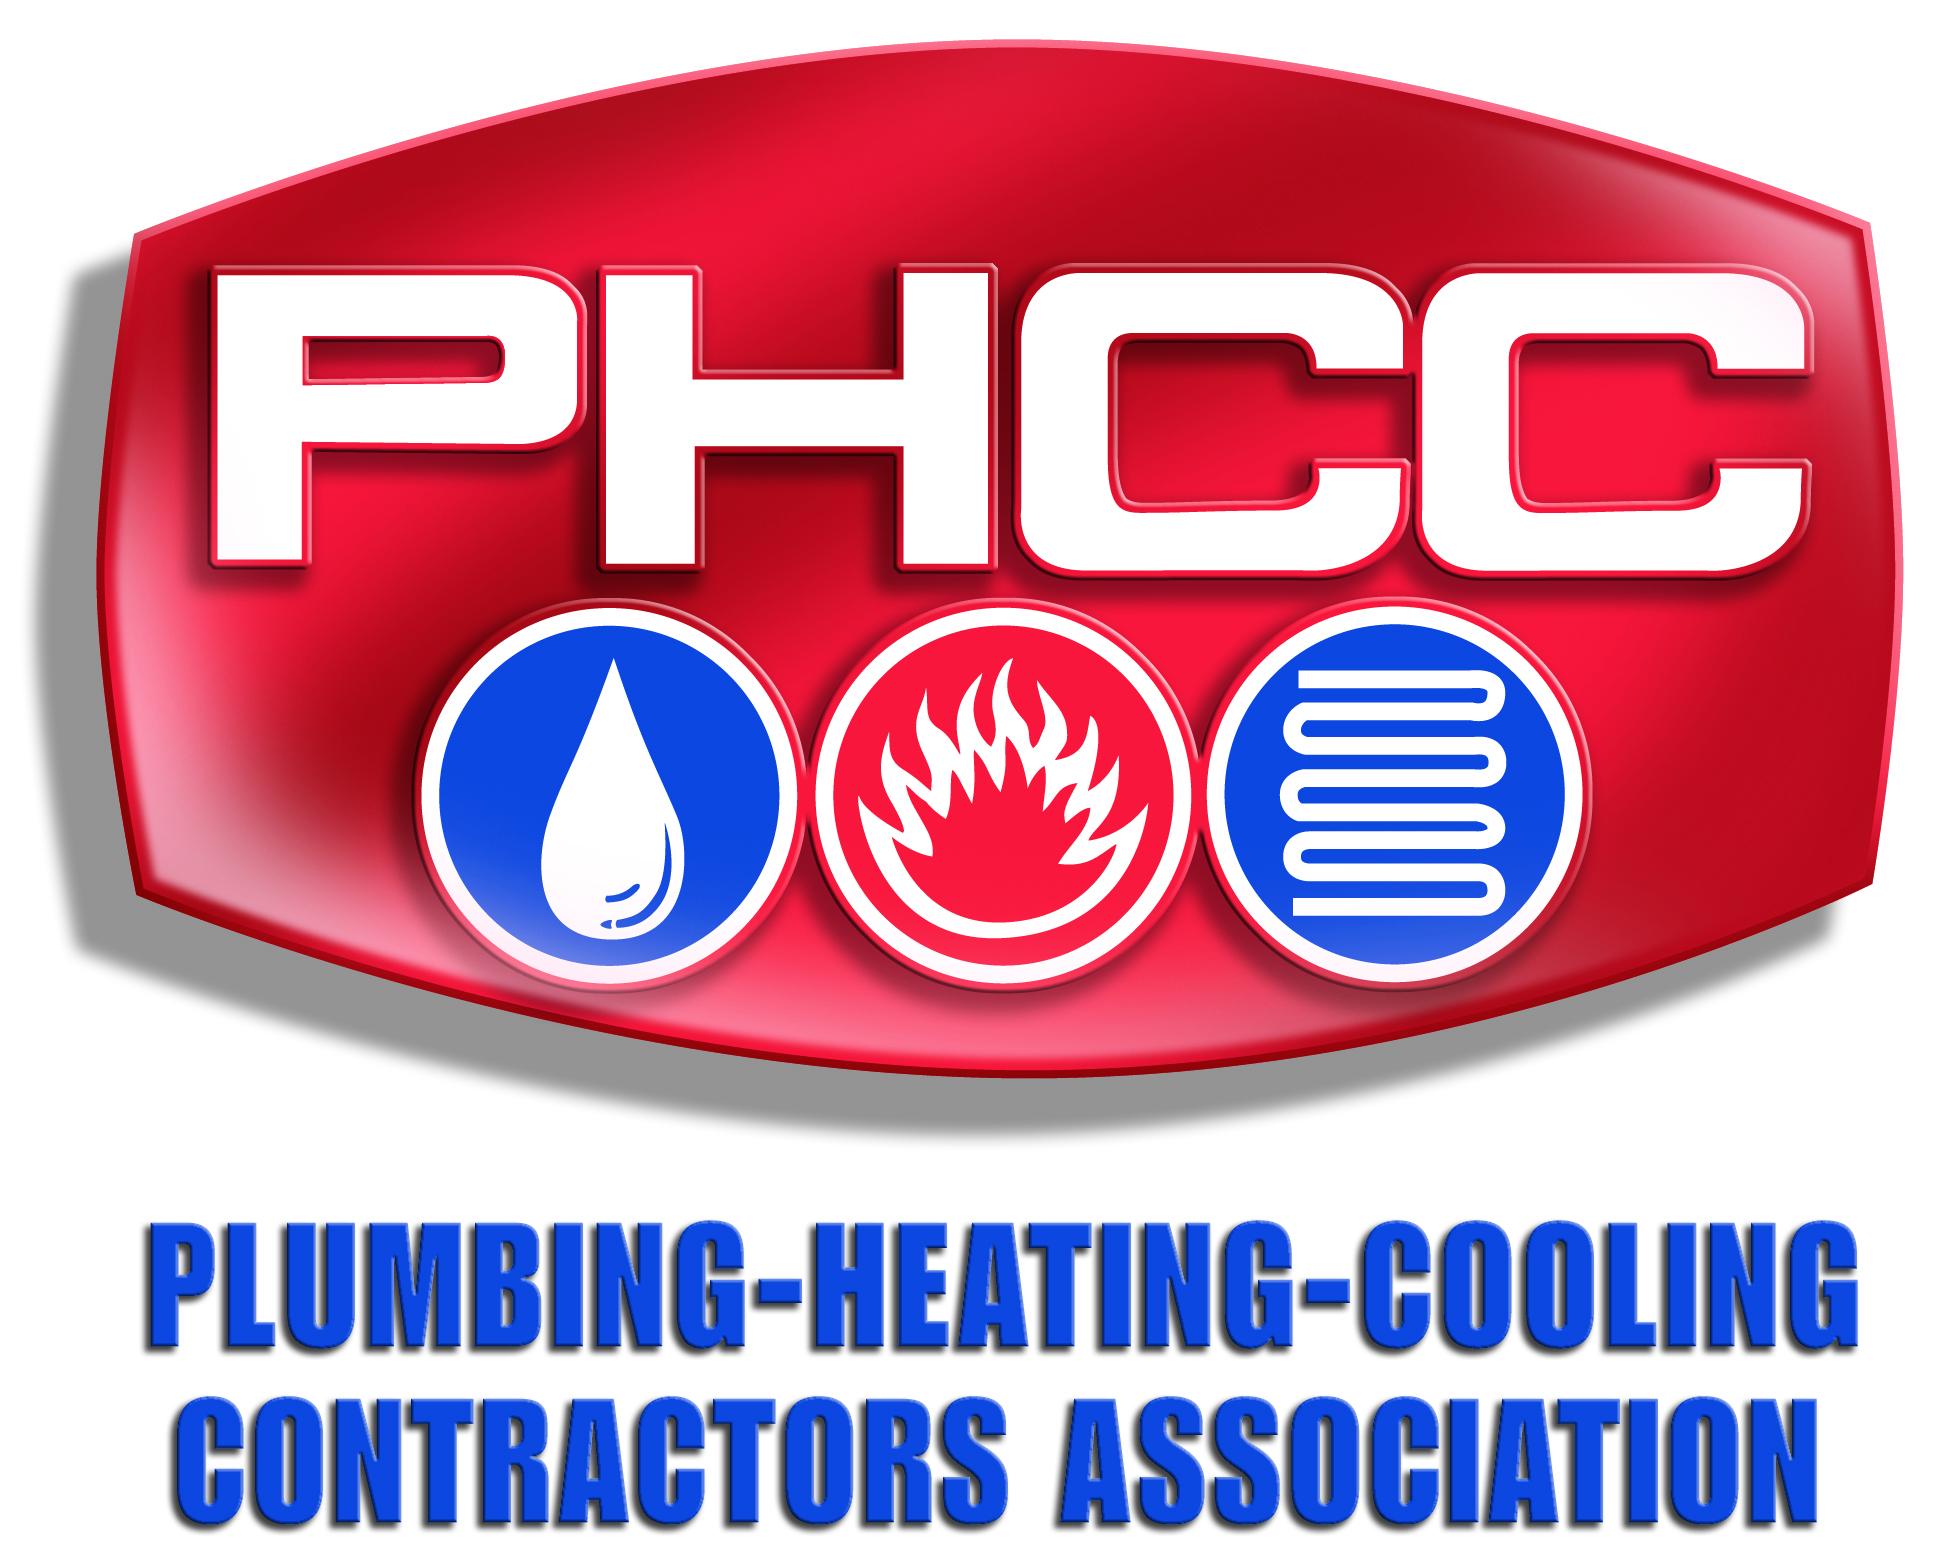 Pennsylvania plumbing, heating and cooling contactors